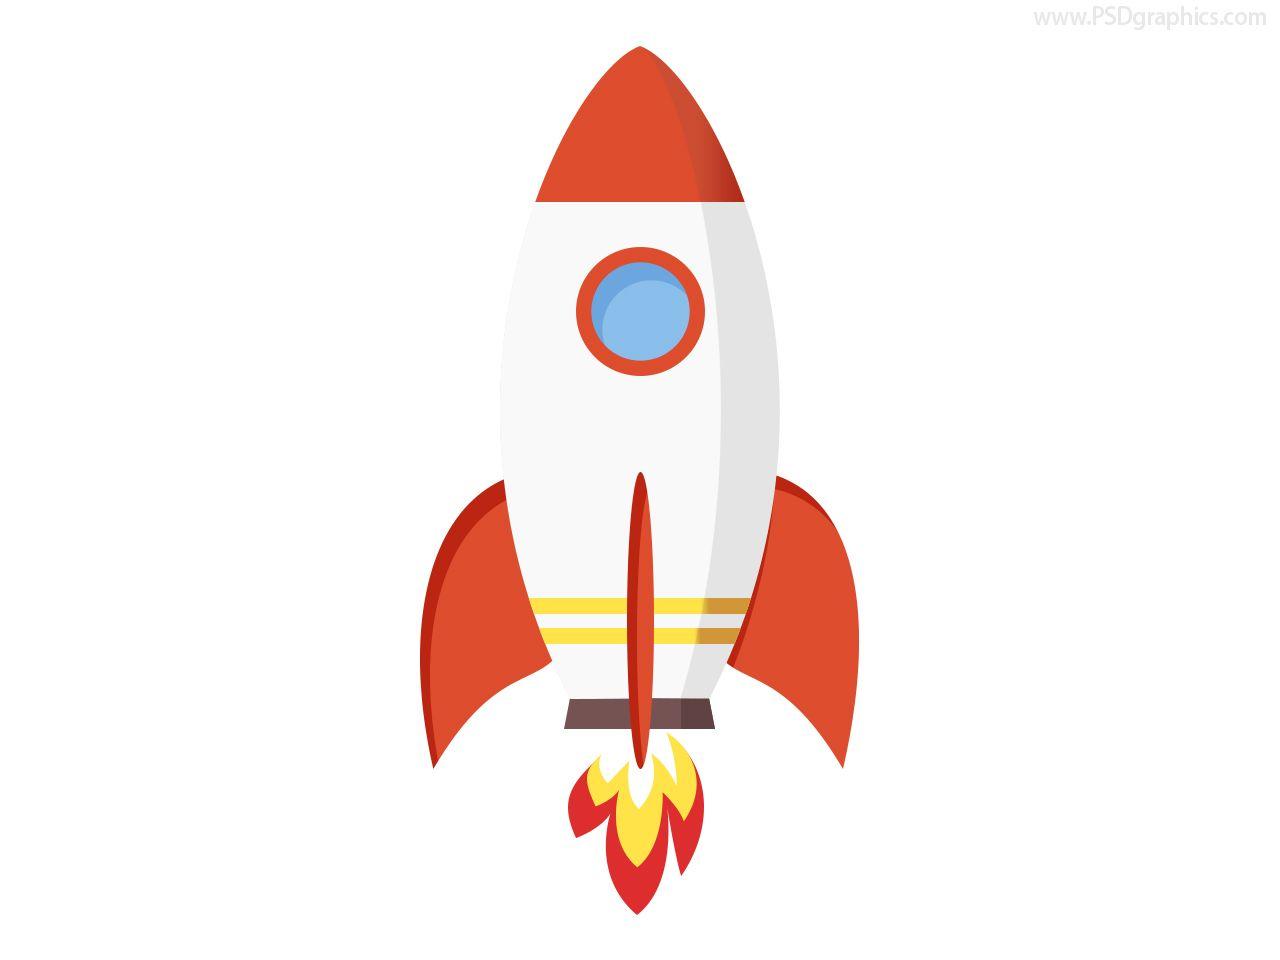 Rocket Icon Jpg 1280 960 Rocket Tattoo Free Icons Rocket